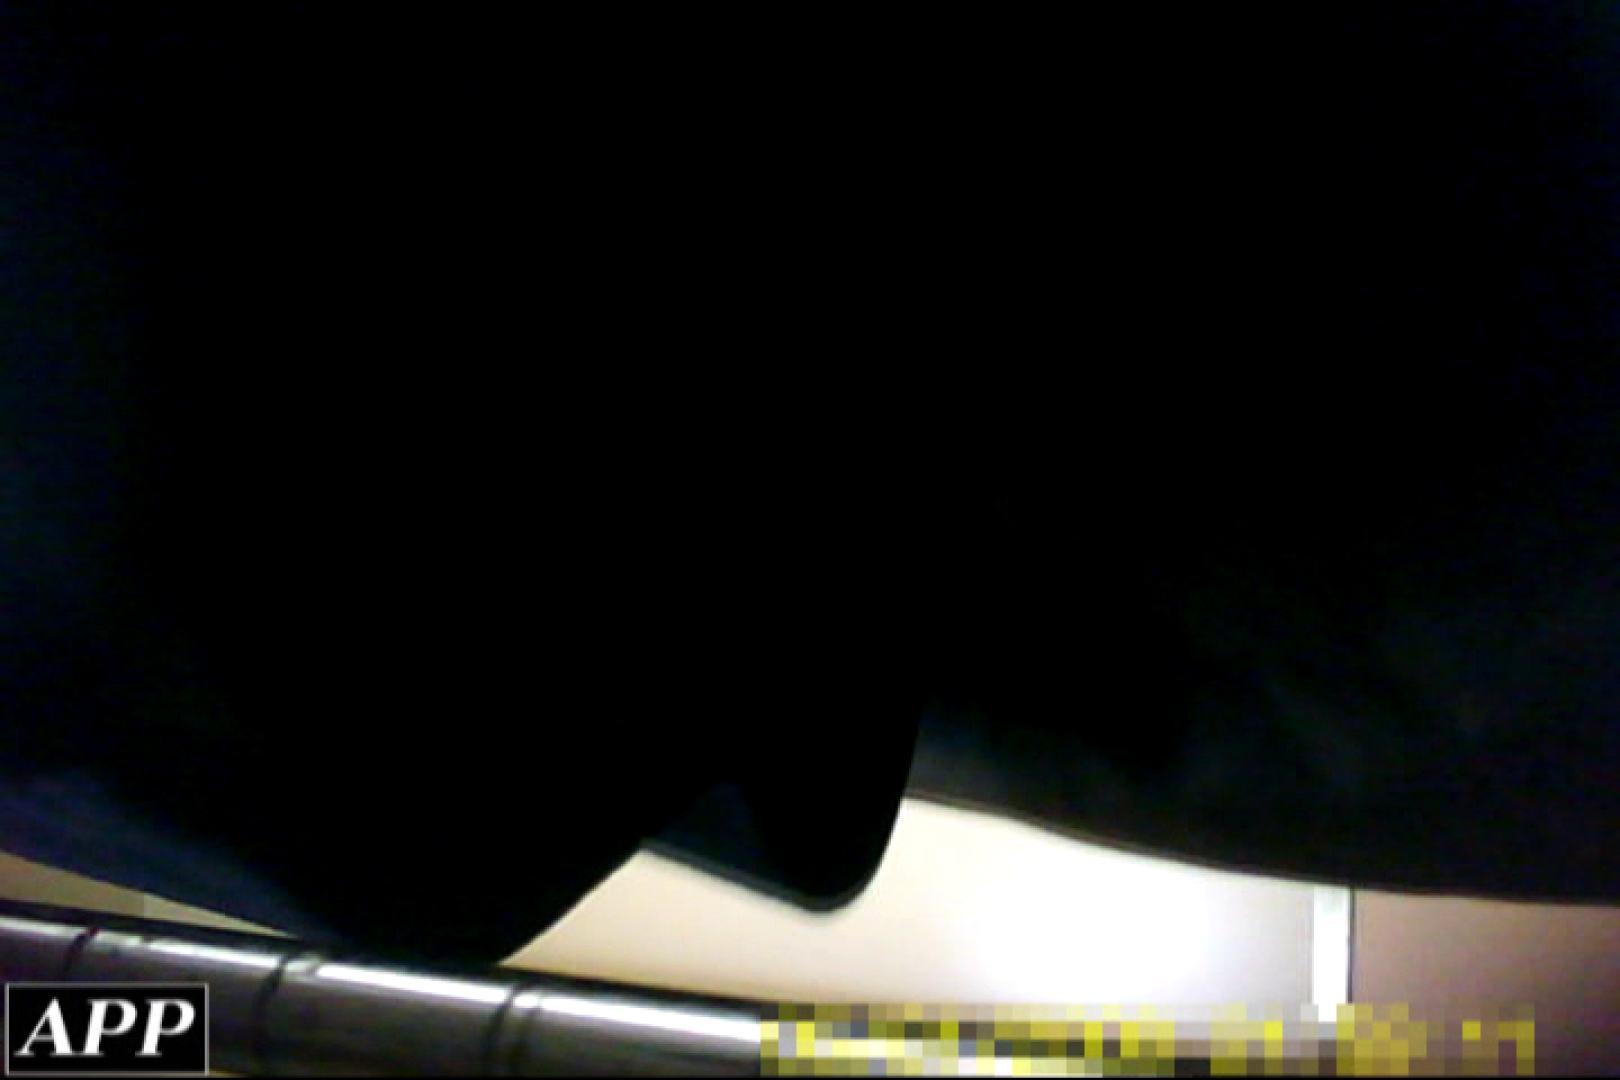 3視点洗面所 vol.42 盗撮で悶絶 スケベ動画紹介 78画像 39